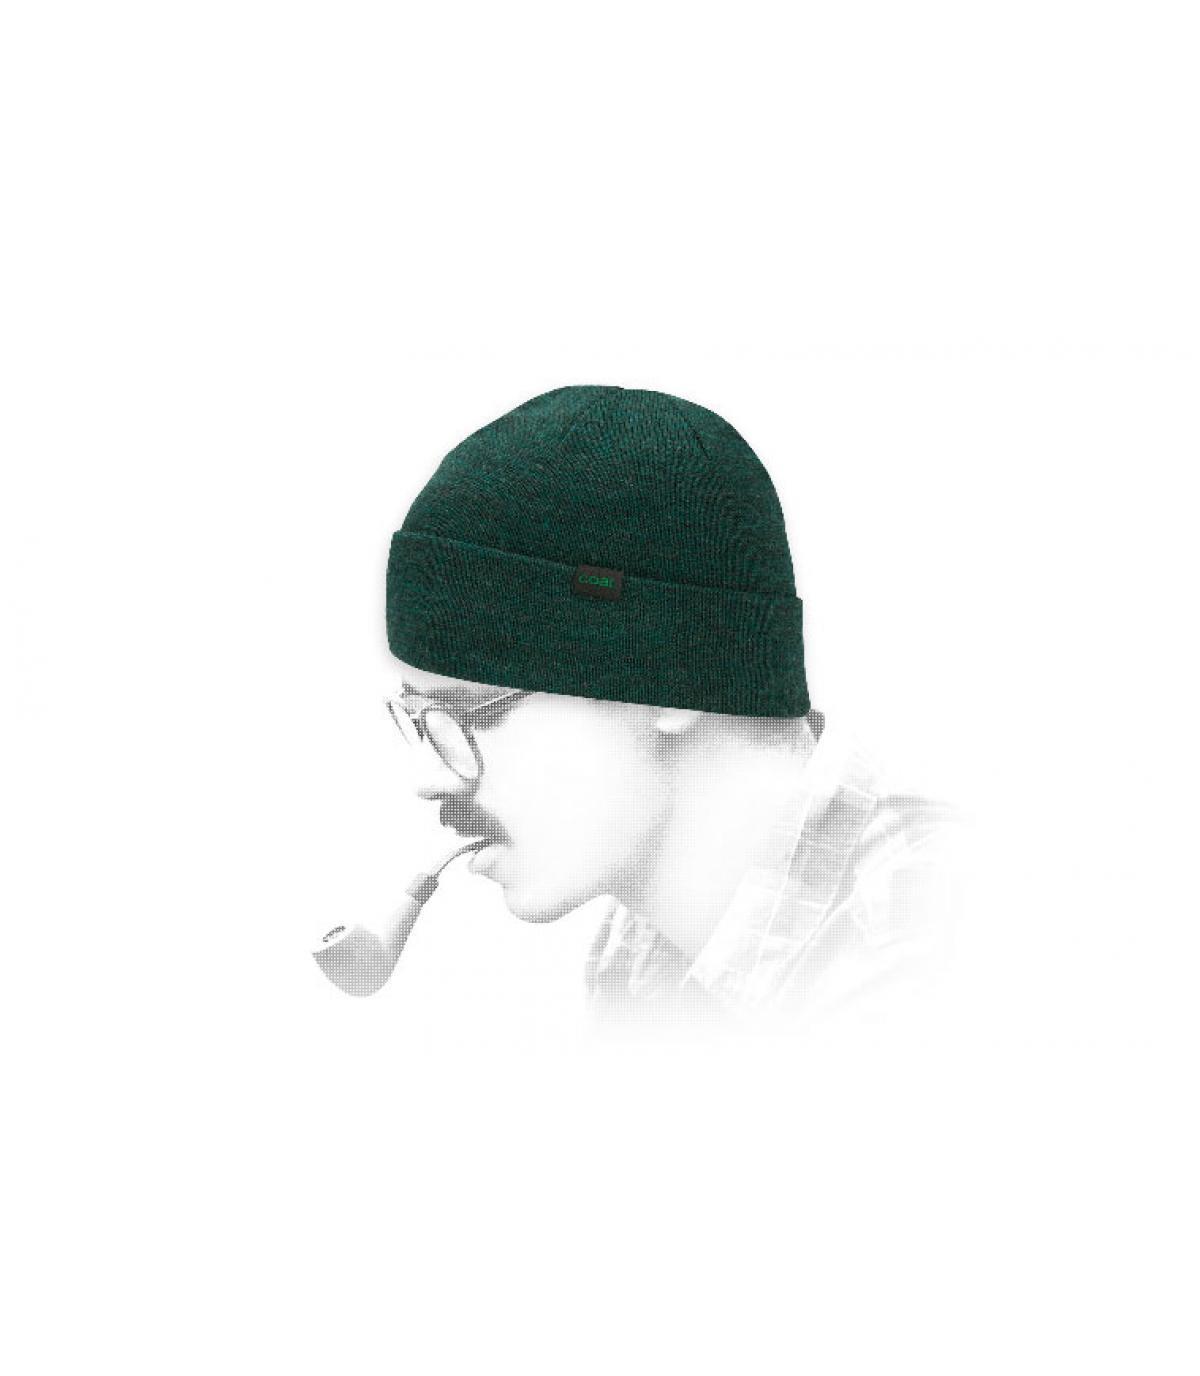 Mütze Coal Wolle grün